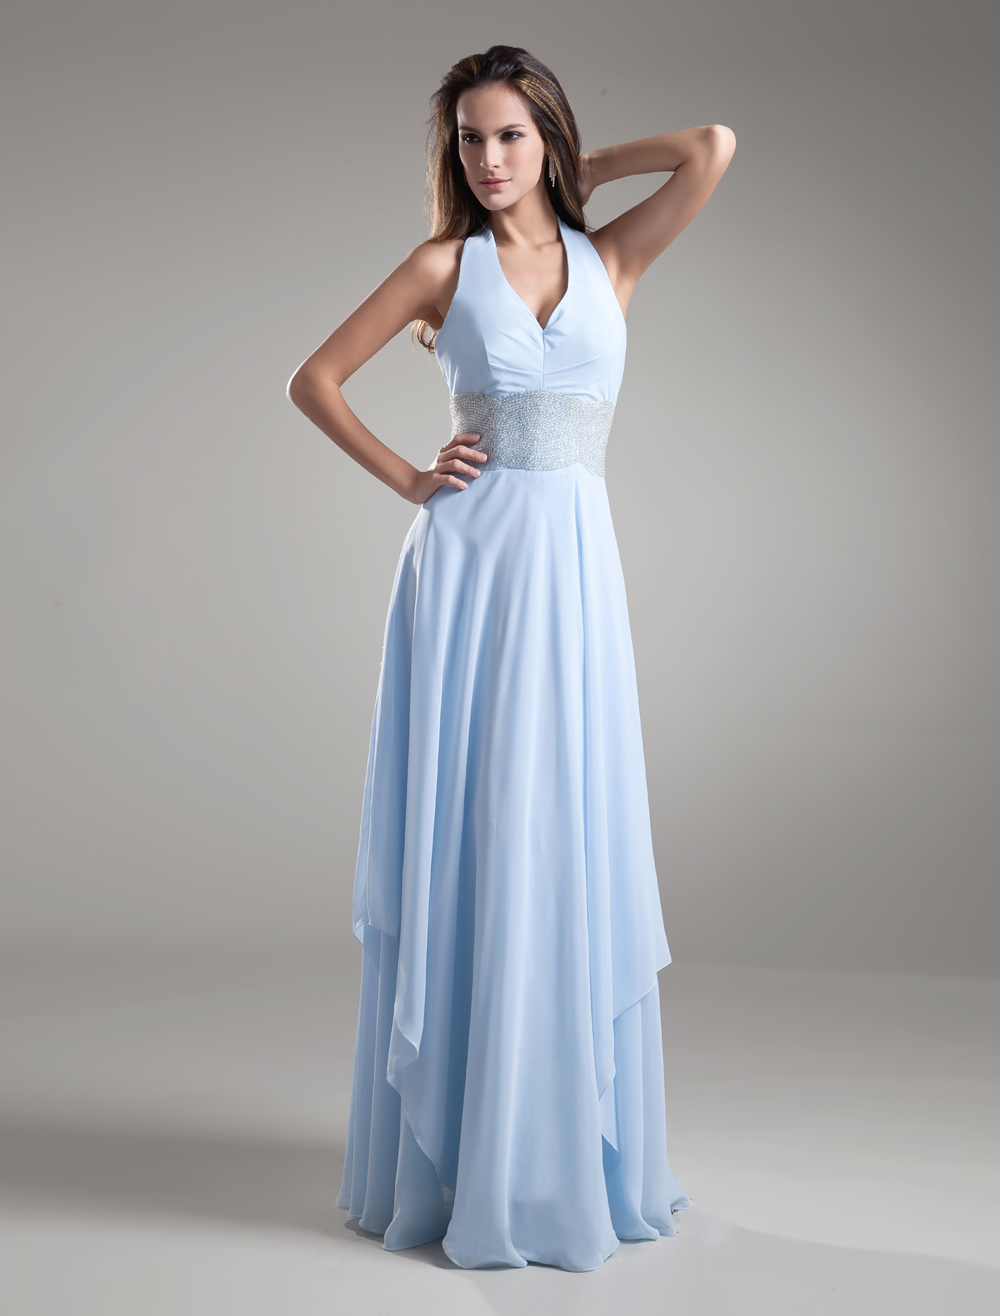 Chiffon Evening Dress Halter Backless Baby Blue Formal Dress Floor Length Beading Waist Long Bridesmaid Dress (Wedding Evening Dresses) photo